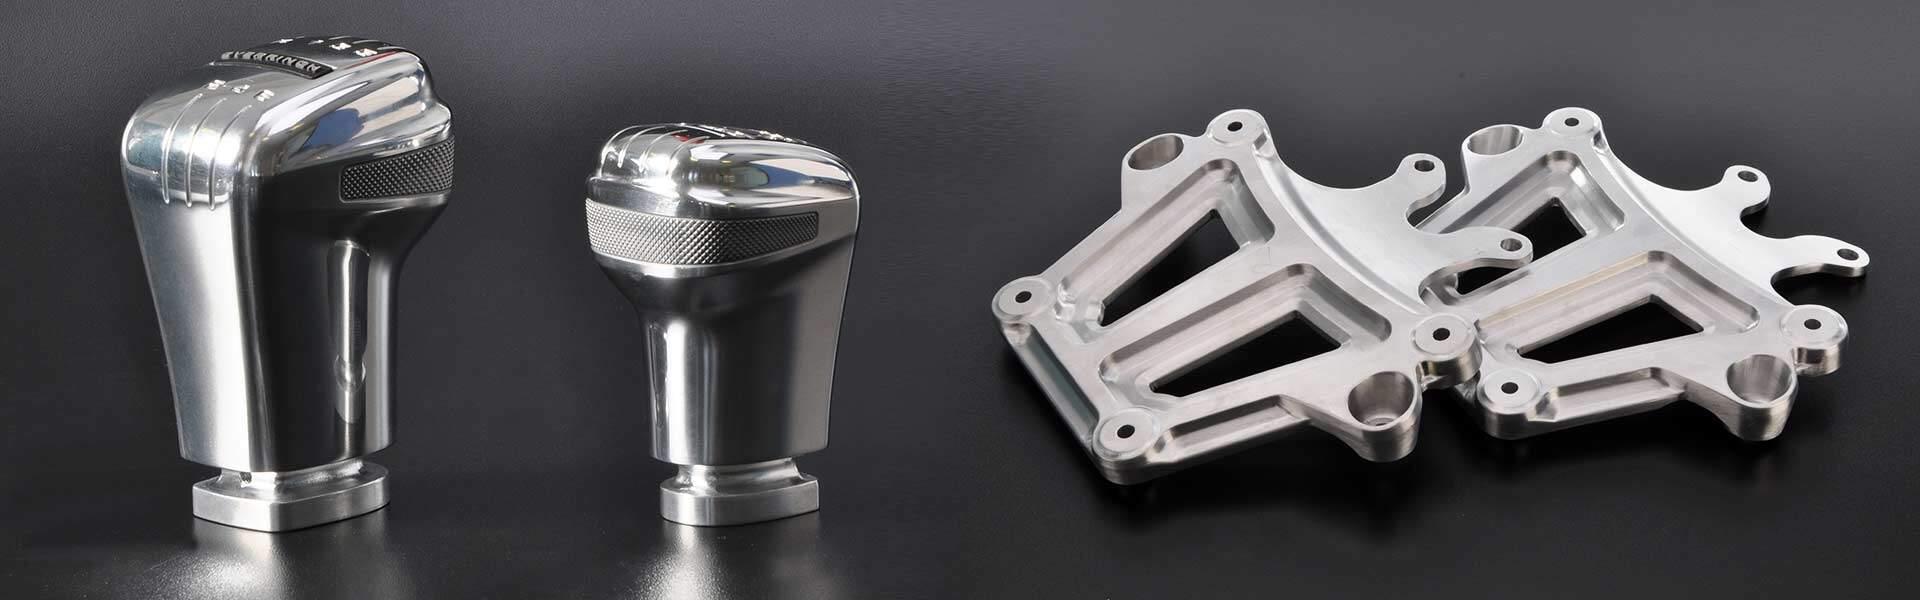 cnc-aluminium-parts